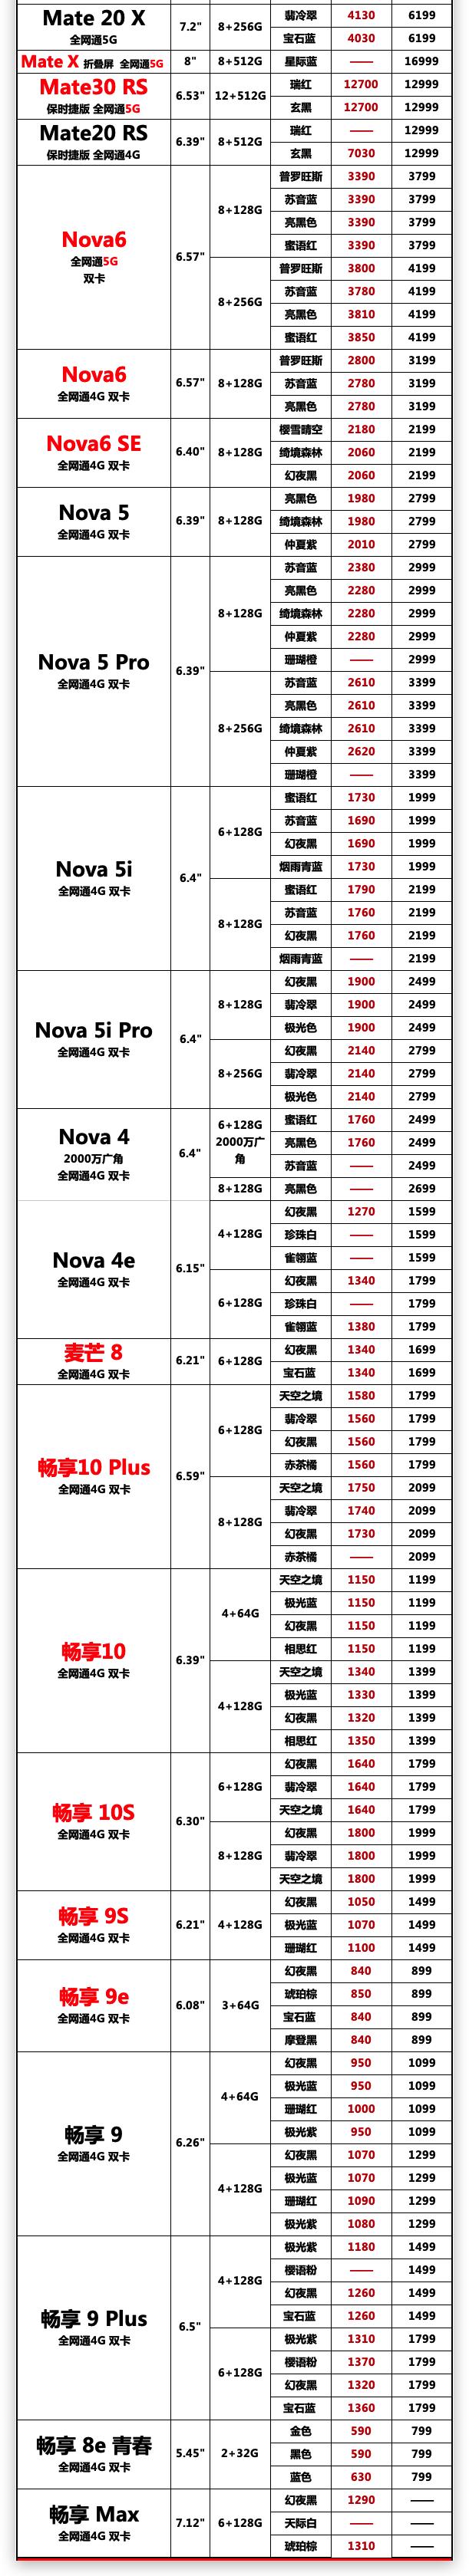 Xnip2020-01-18_10-53-35.png